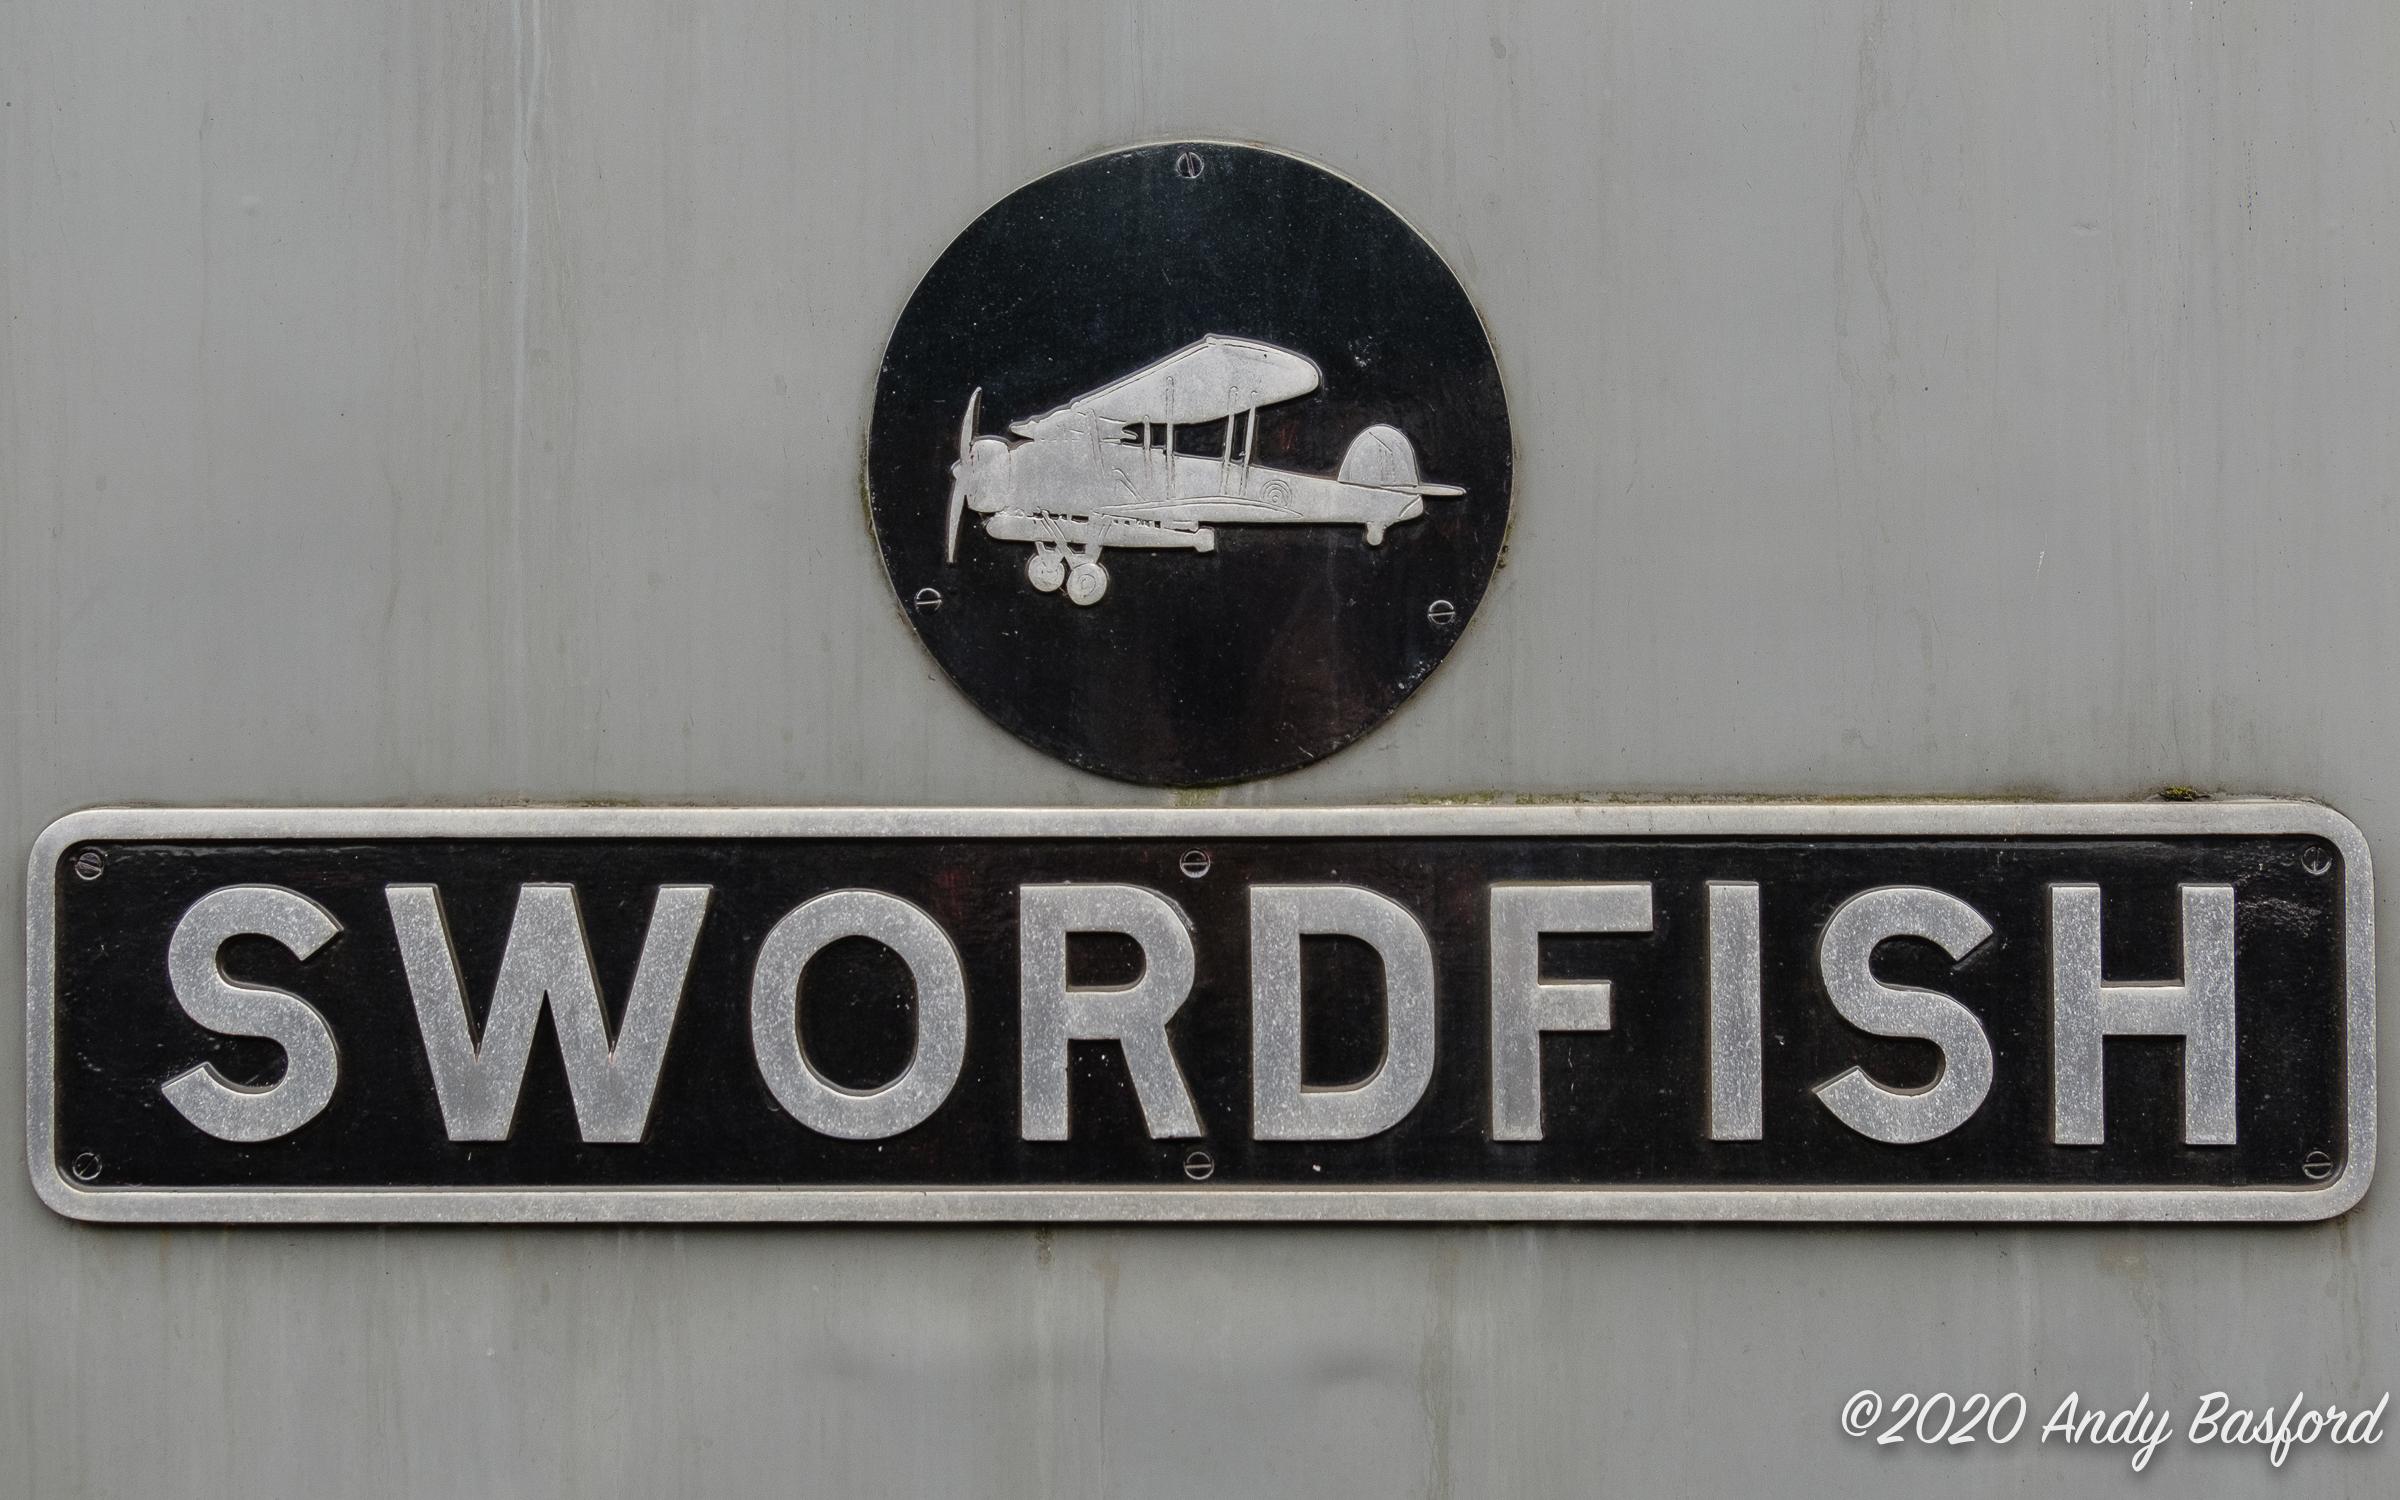 'SWORDFISH'